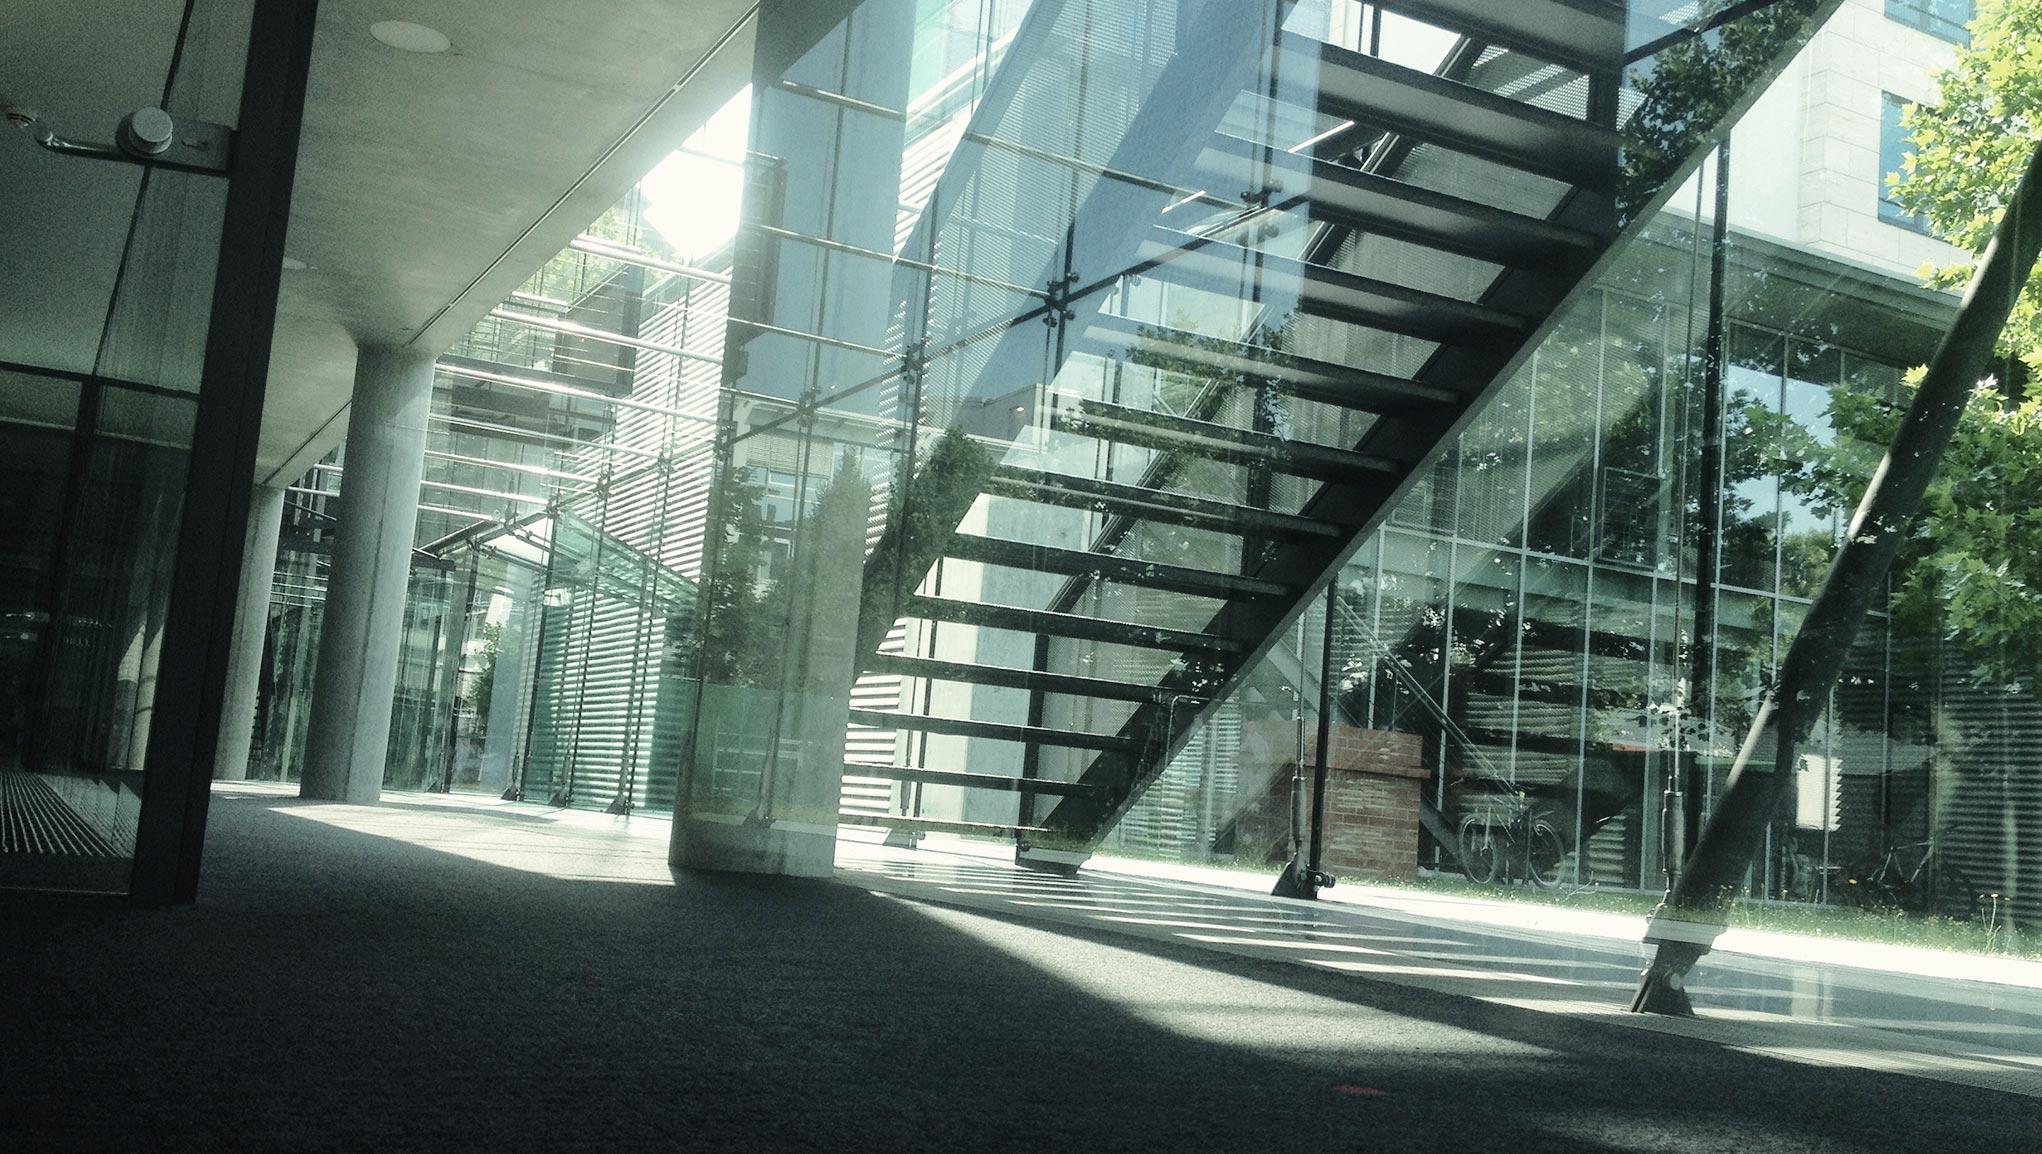 differently 6e151 3c2de Large enterprises – Ifs business area Industrial  If